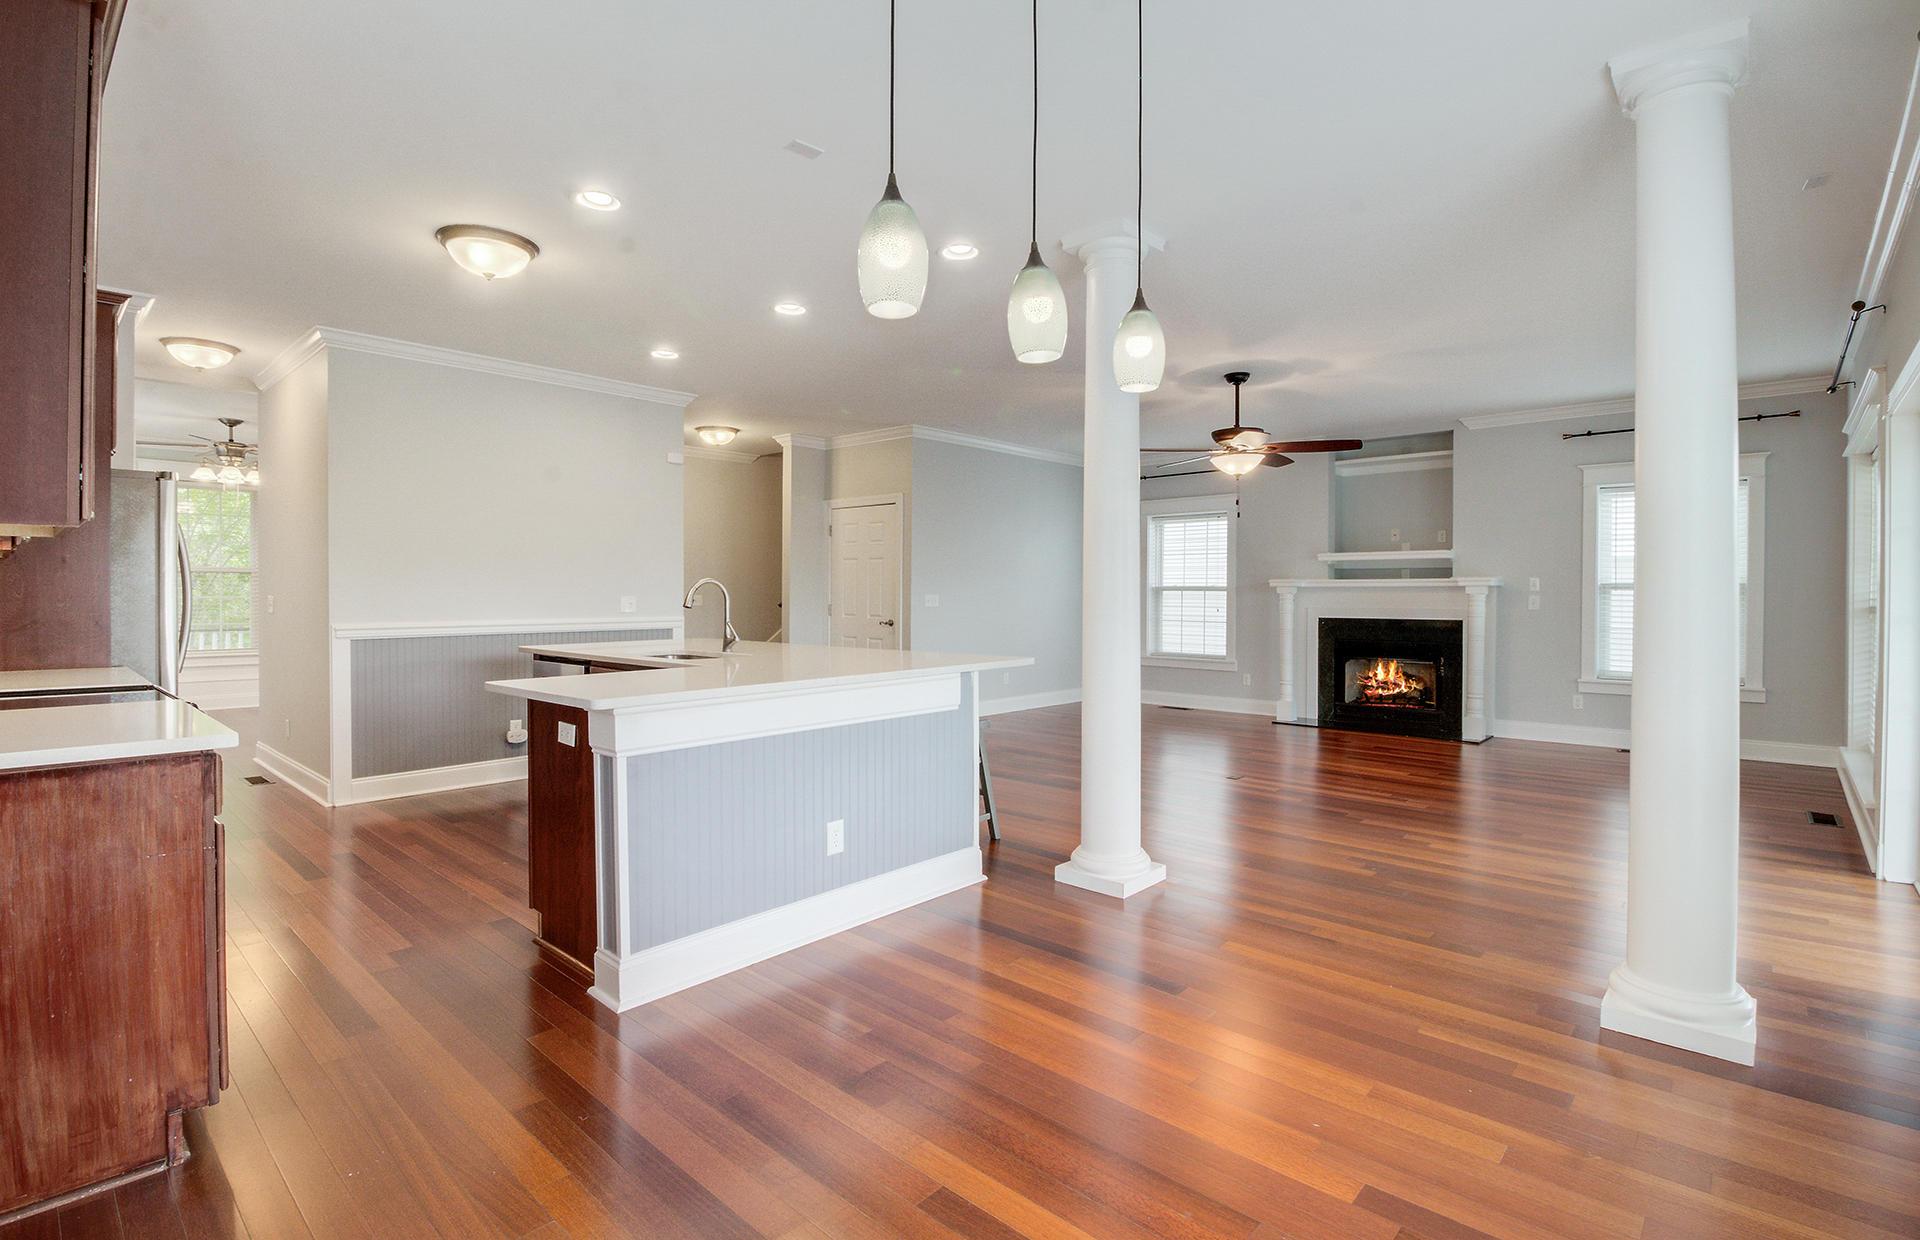 Daniel Island Homes For Sale - 306 Ladd, Charleston, SC - 15